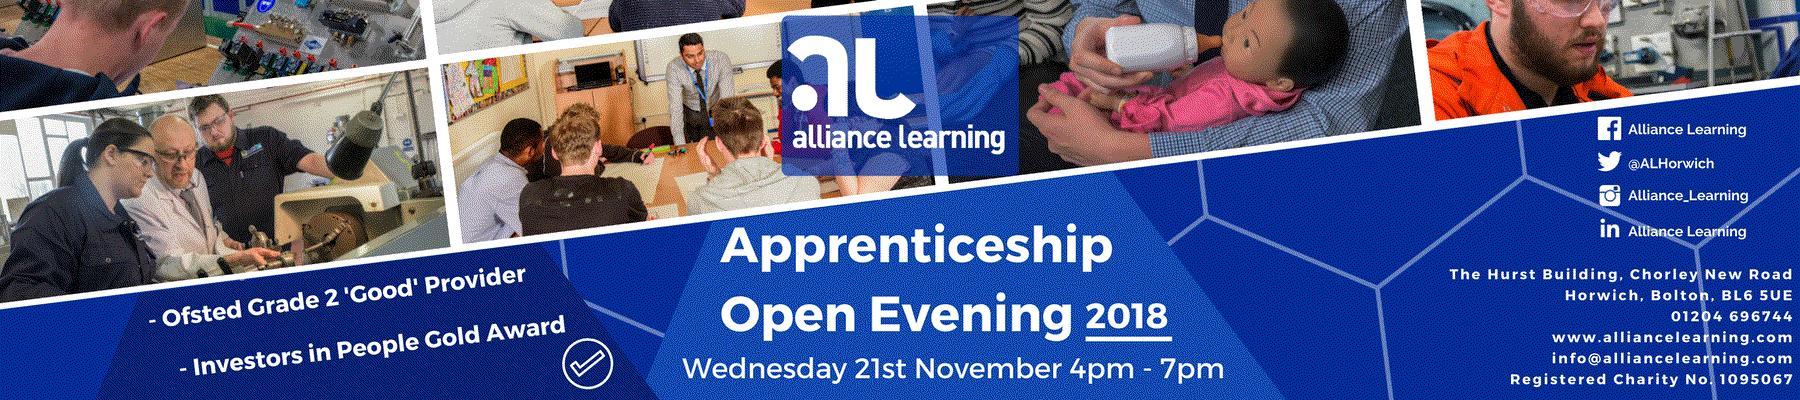 Alliance learning apprenticeships